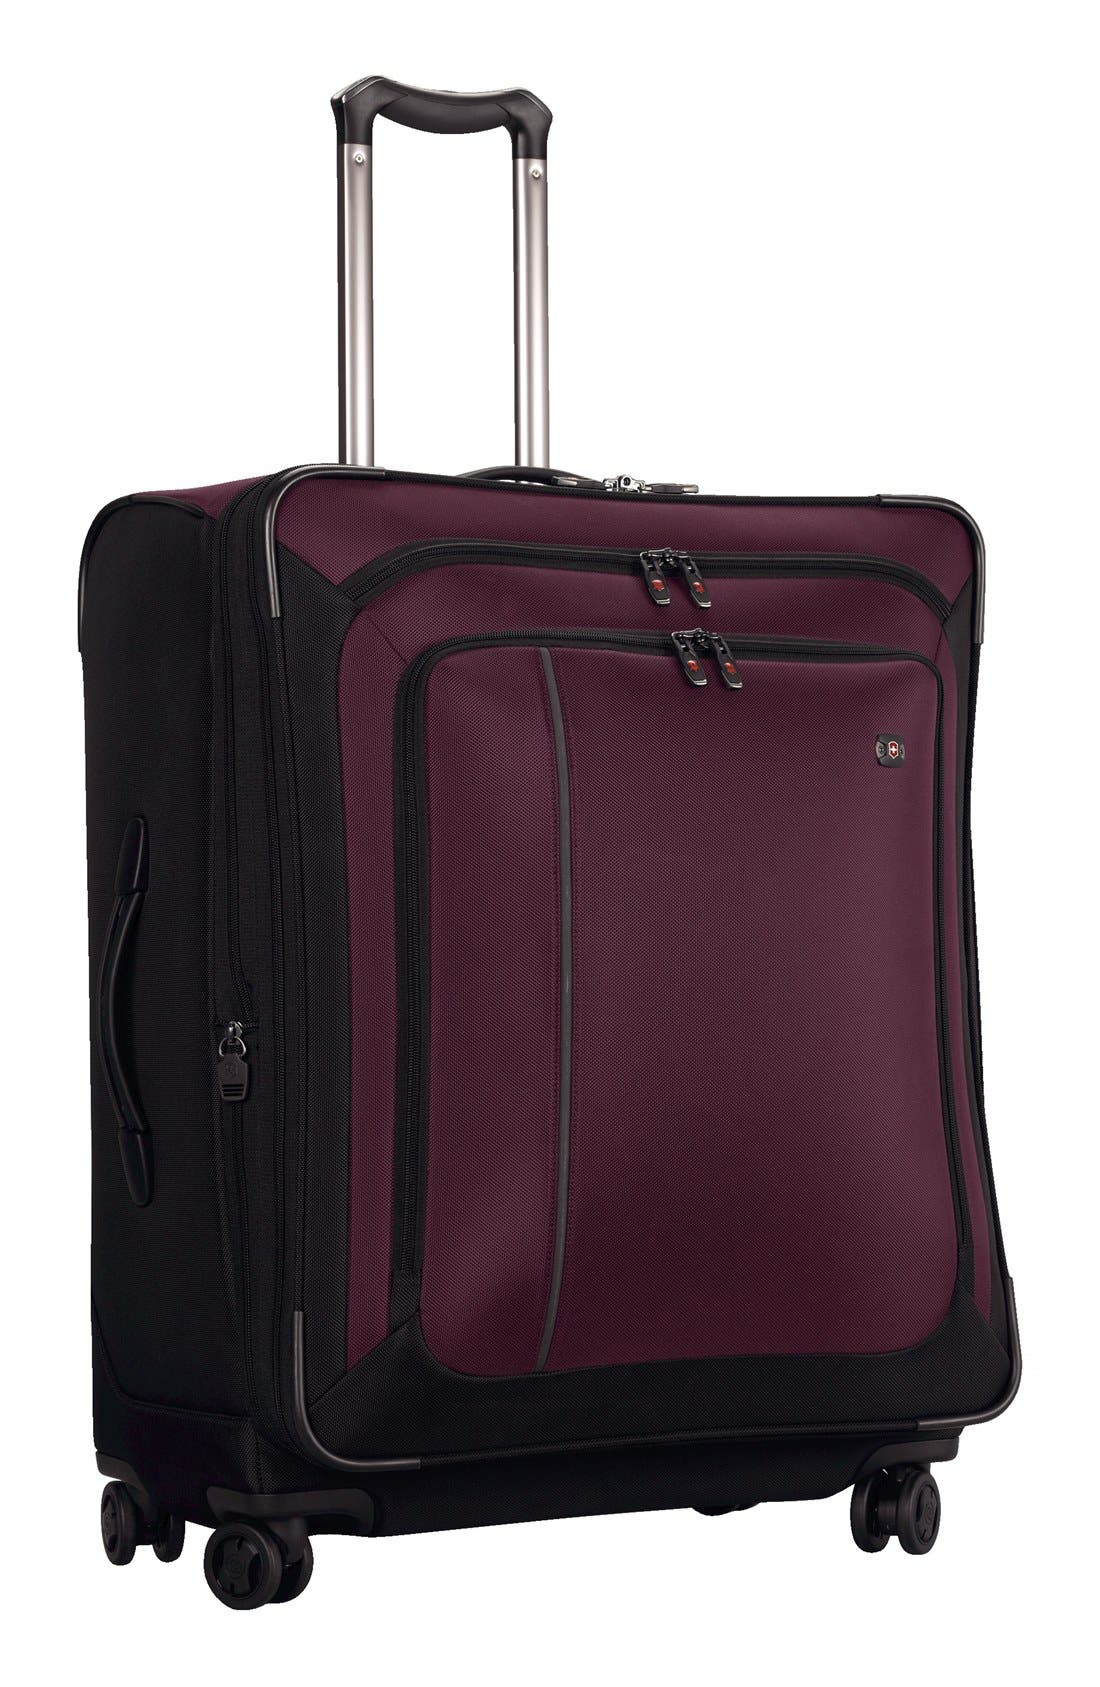 Alternate Image 1 Selected - Victorinox Swiss Army® 'Werks - Traveler' Rolling Suitcase (24 Inch)